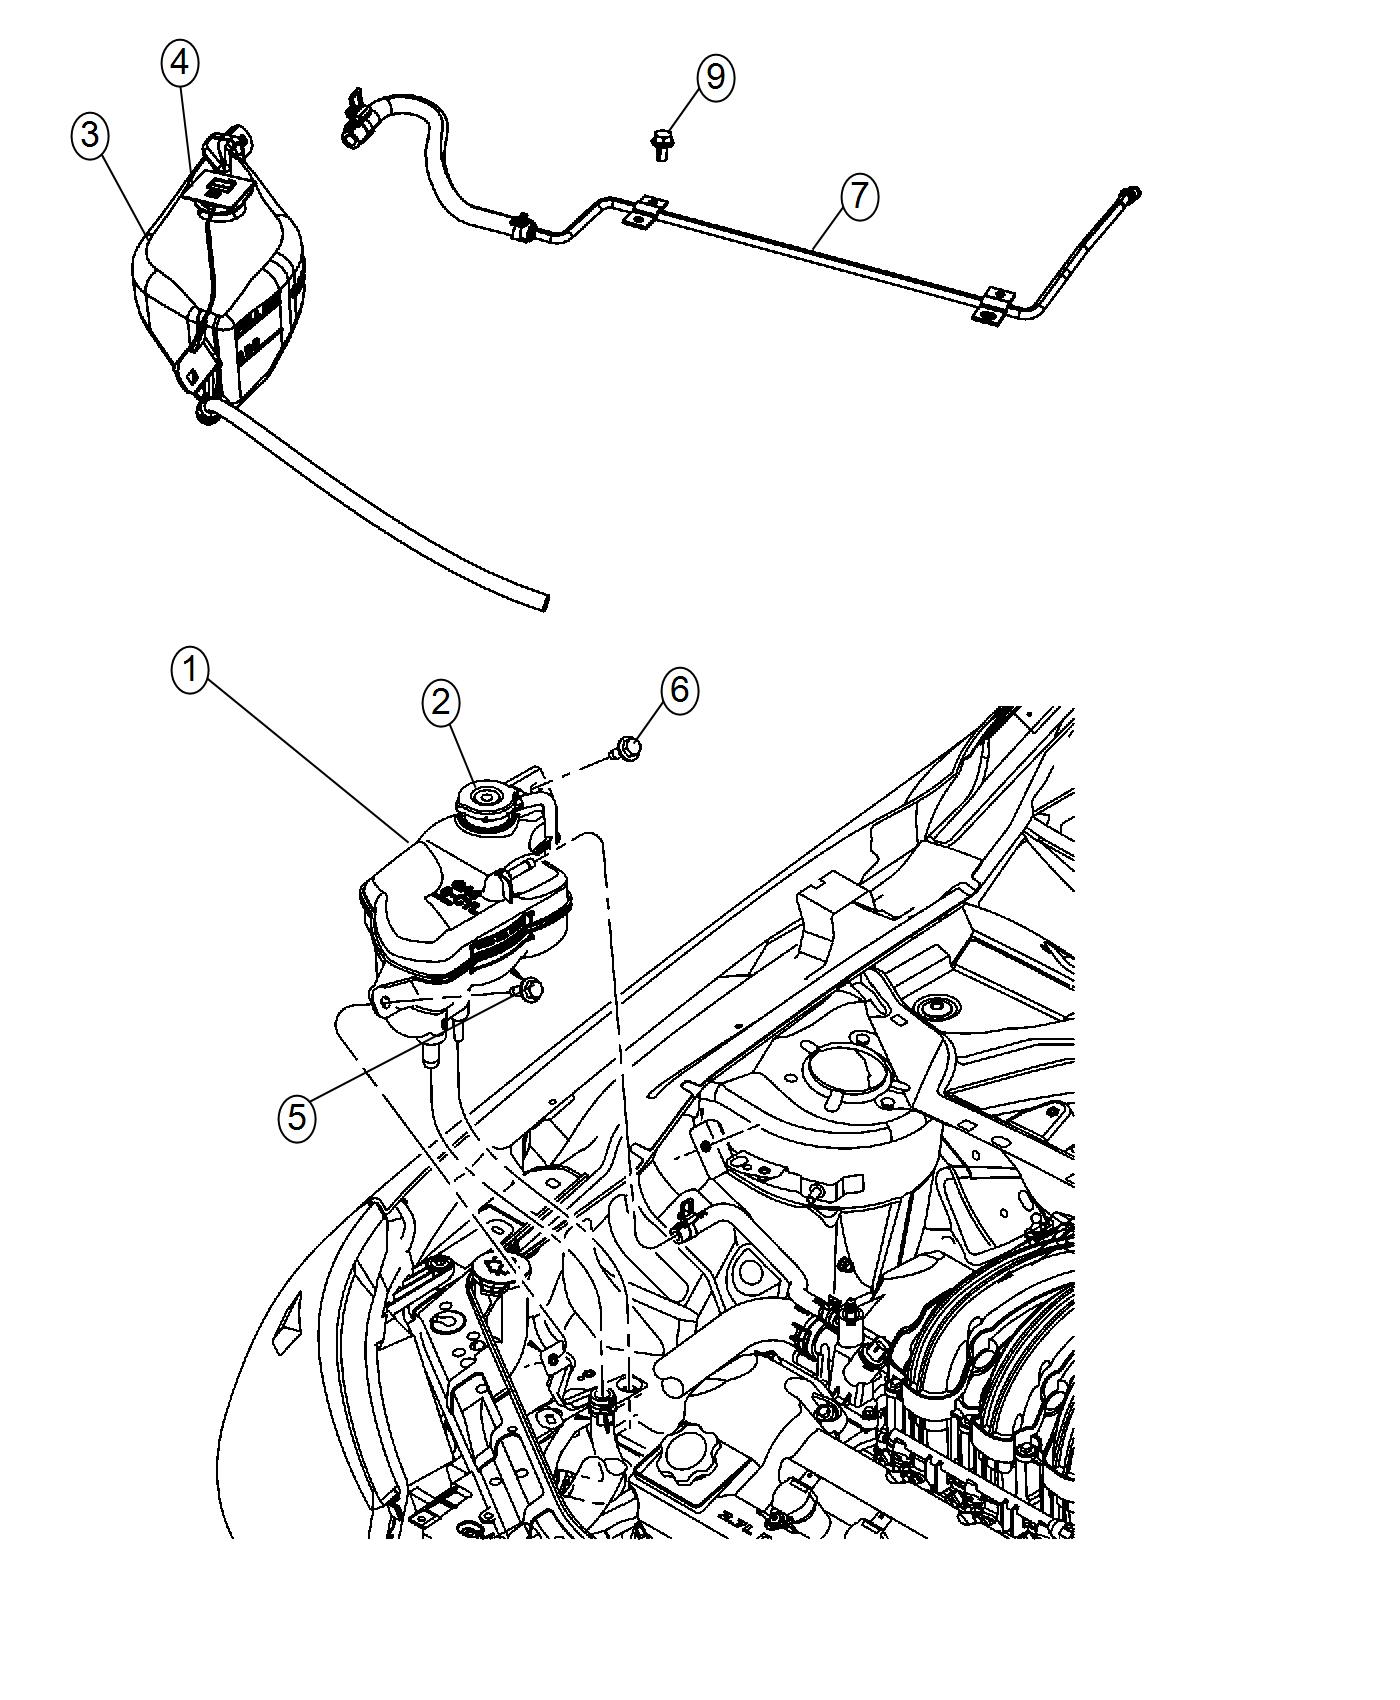 Chrysler Sebring Bottle Pressurized Coolant Engine